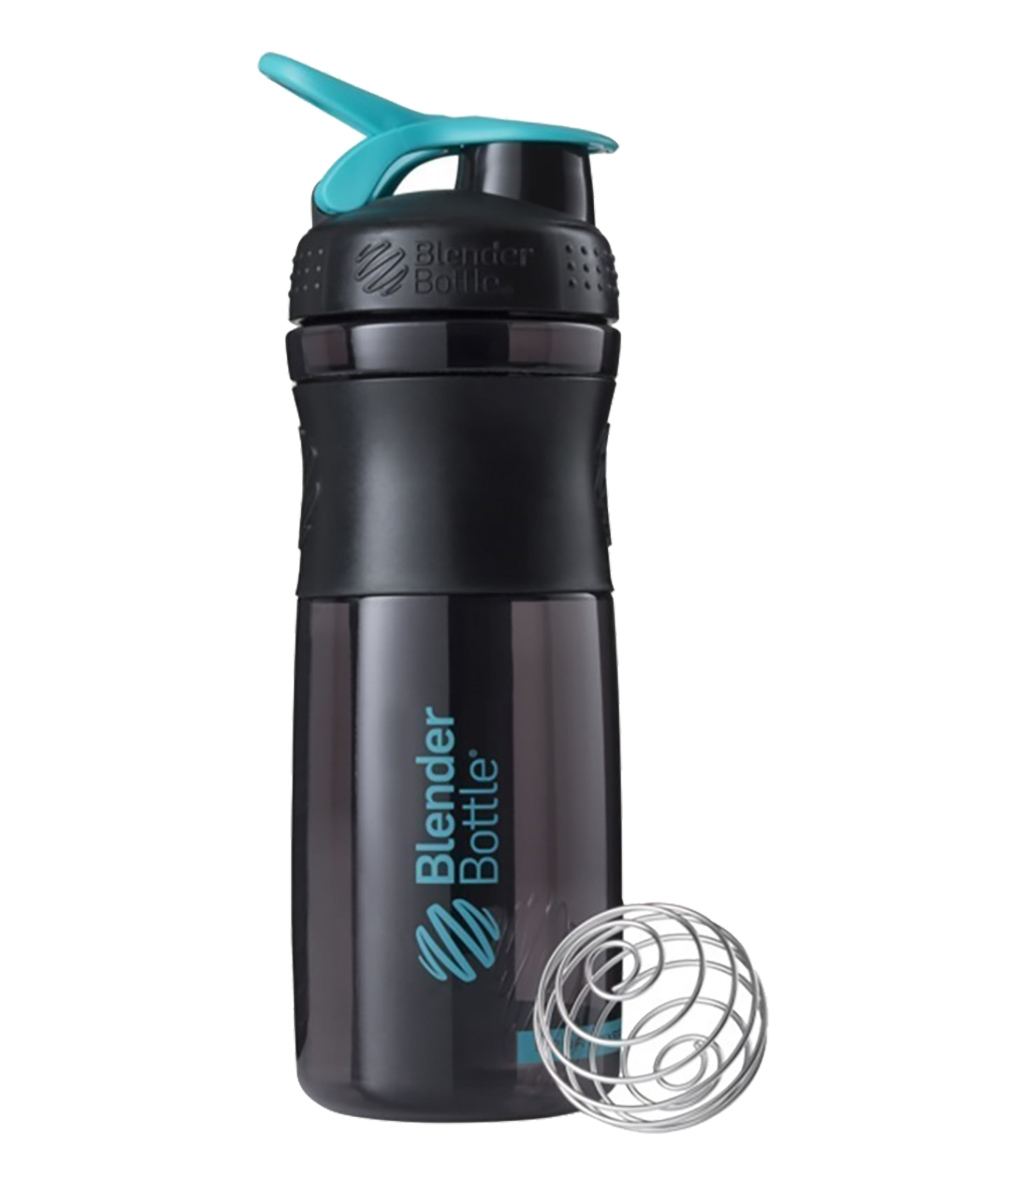 Blender Bottle Sportmixer Siyah Aqua 760 ml